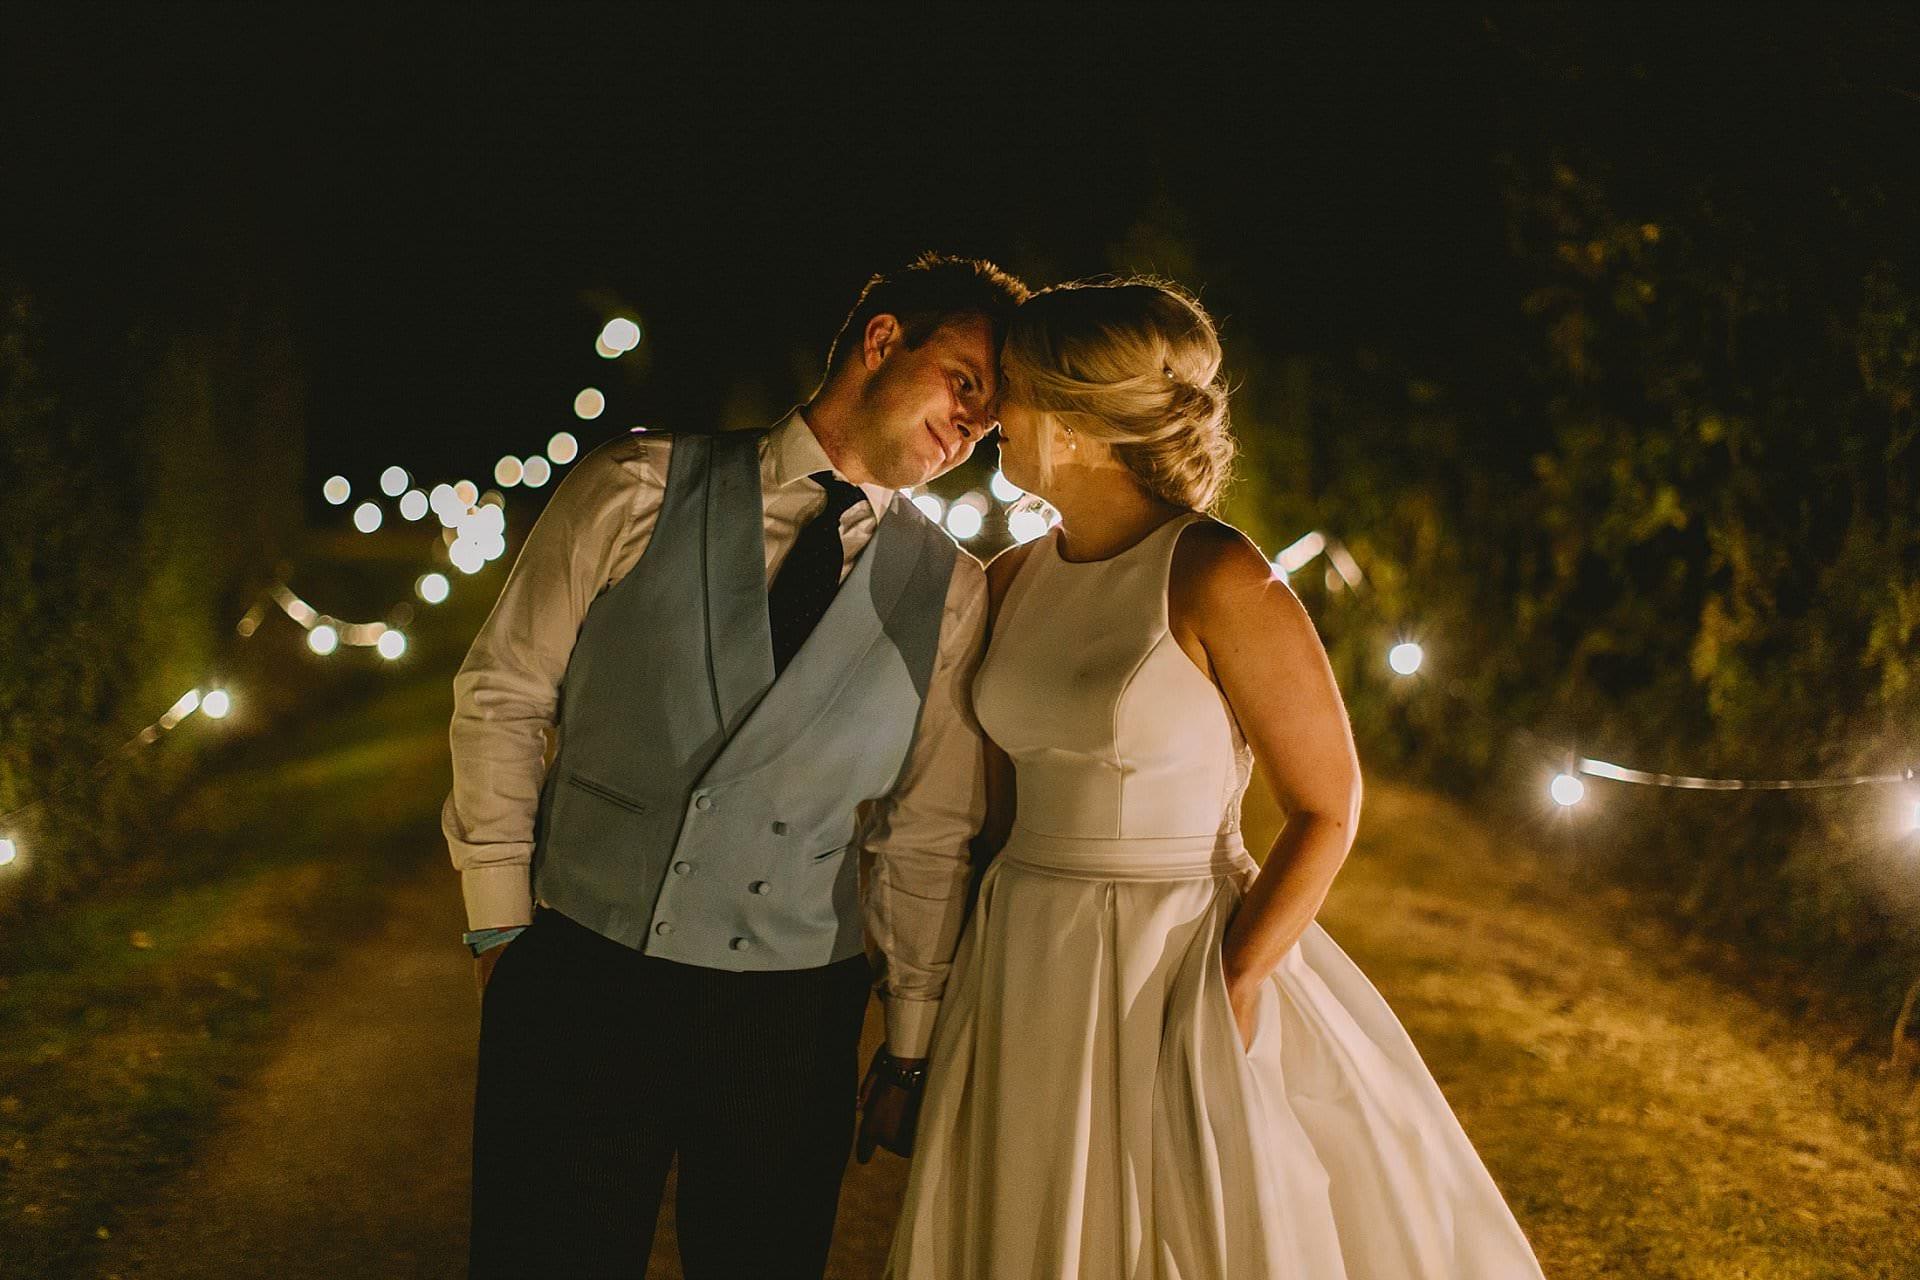 Wedding photography best of 2018